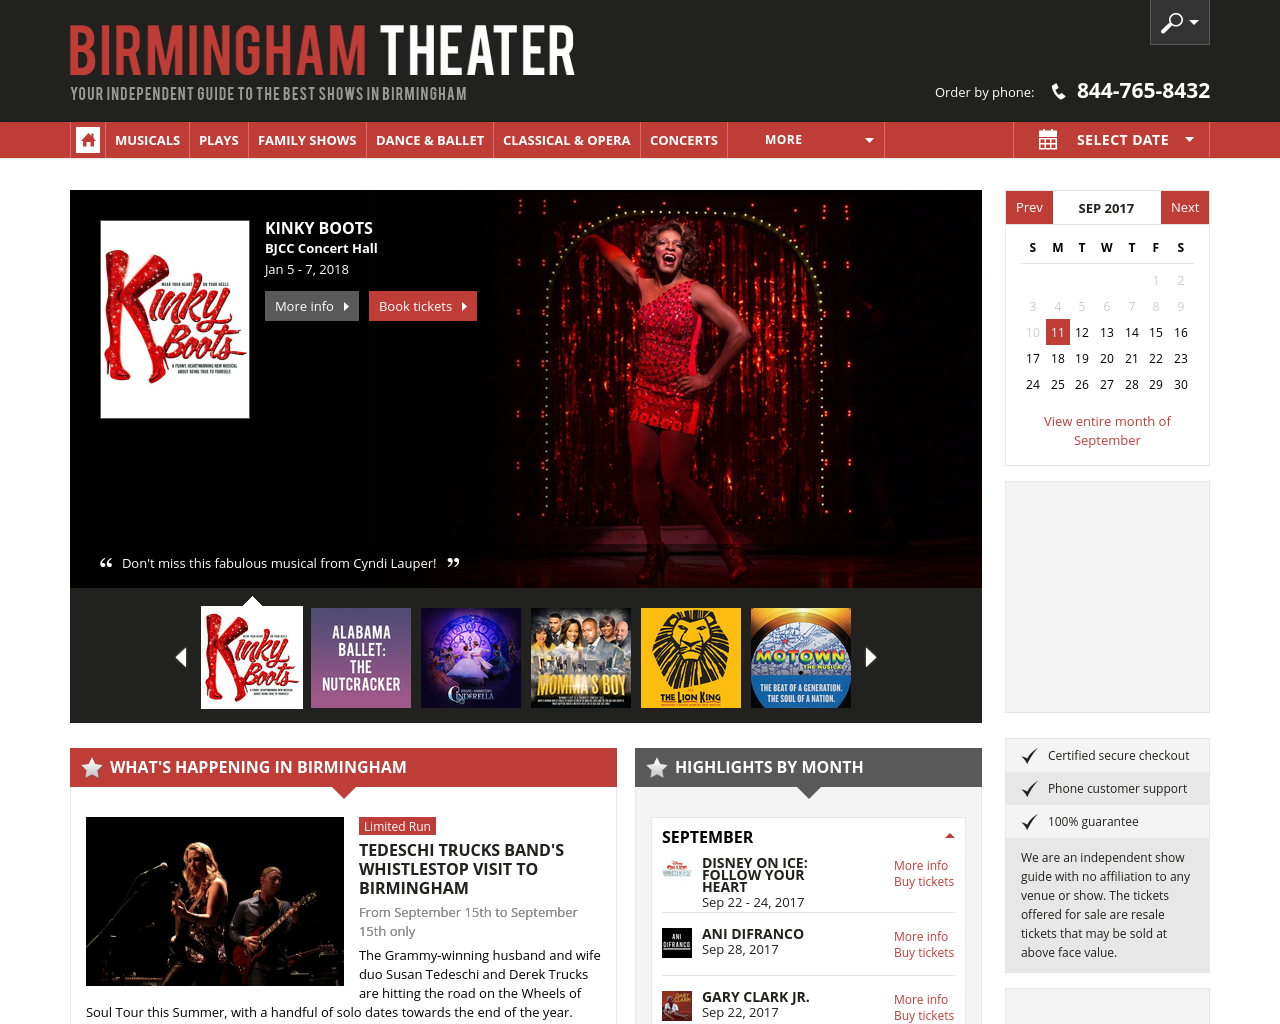 Birmingham-Theater-Advertising-Reviews-Pricing